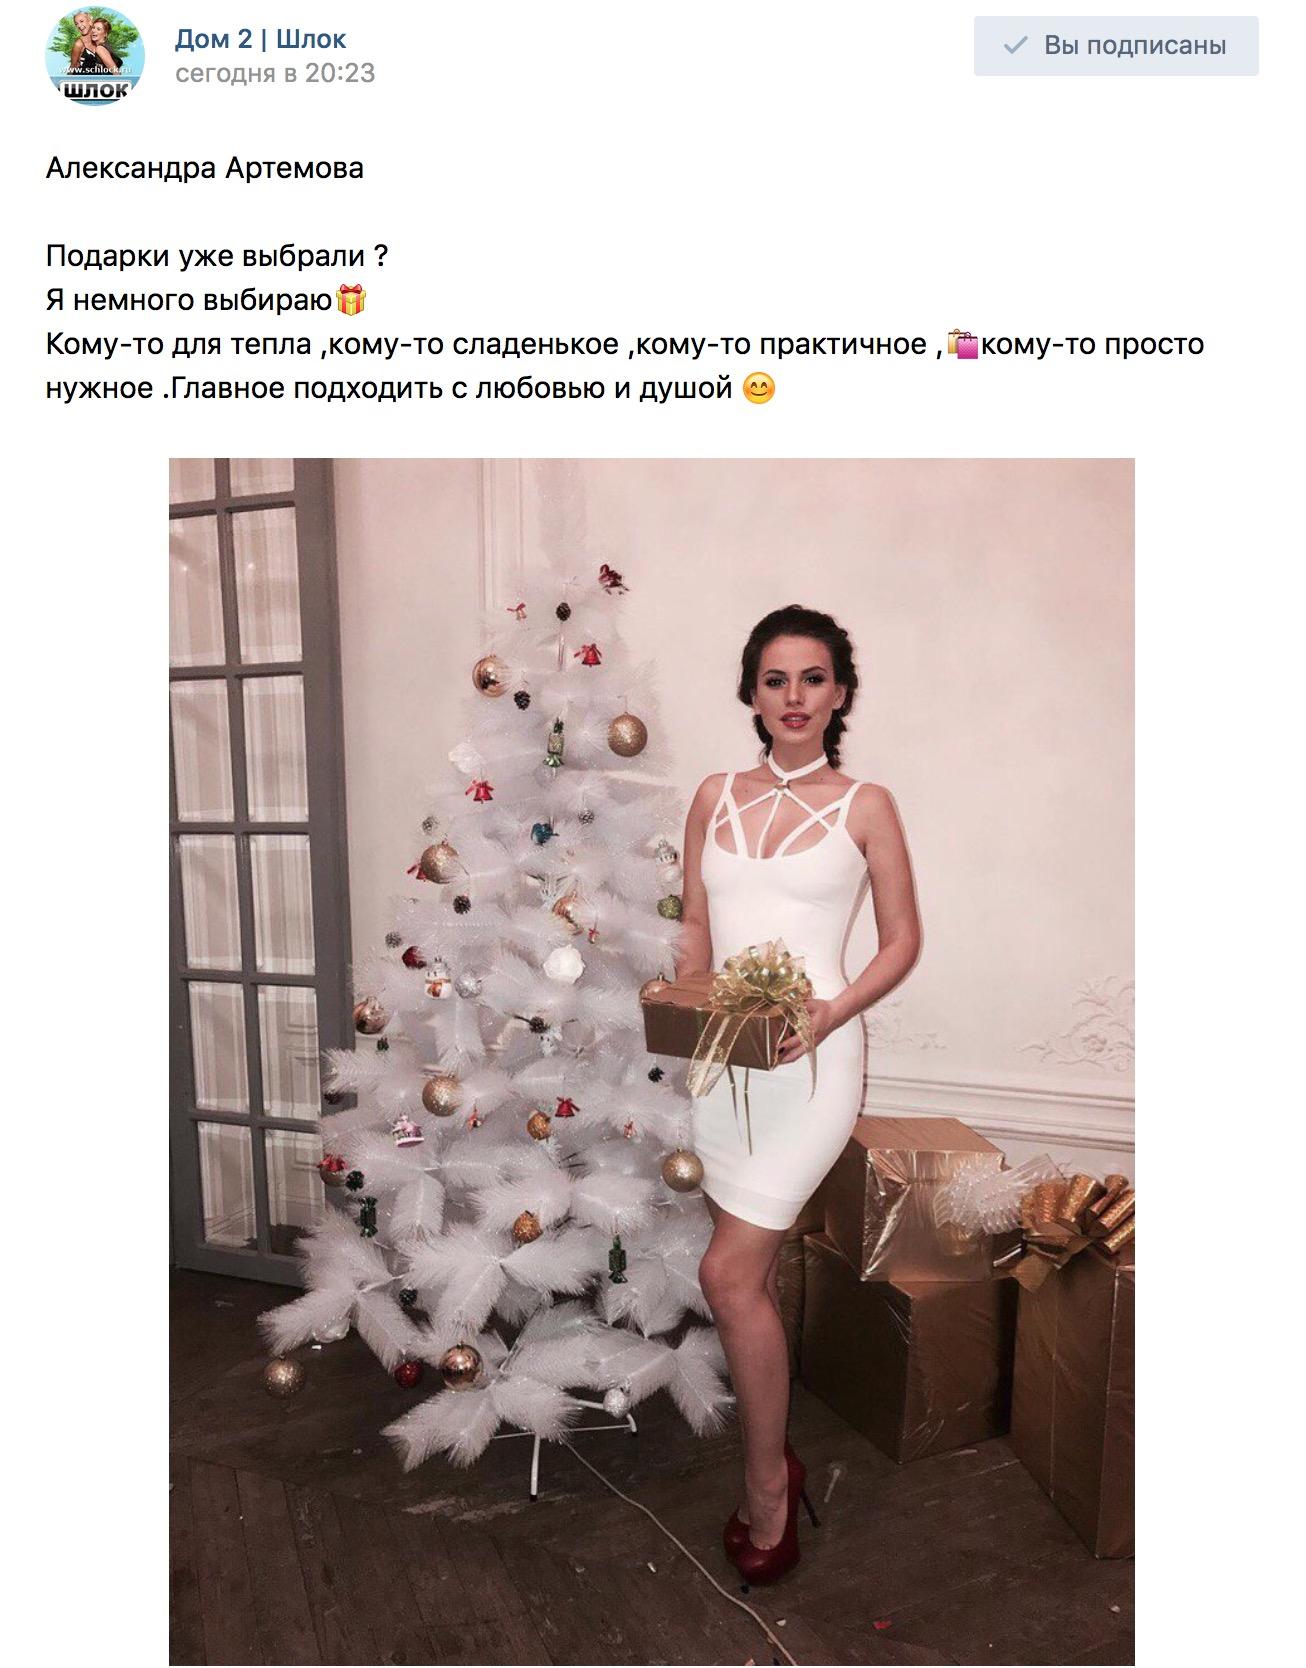 Александра Артемова. Подарки уже выбрали?